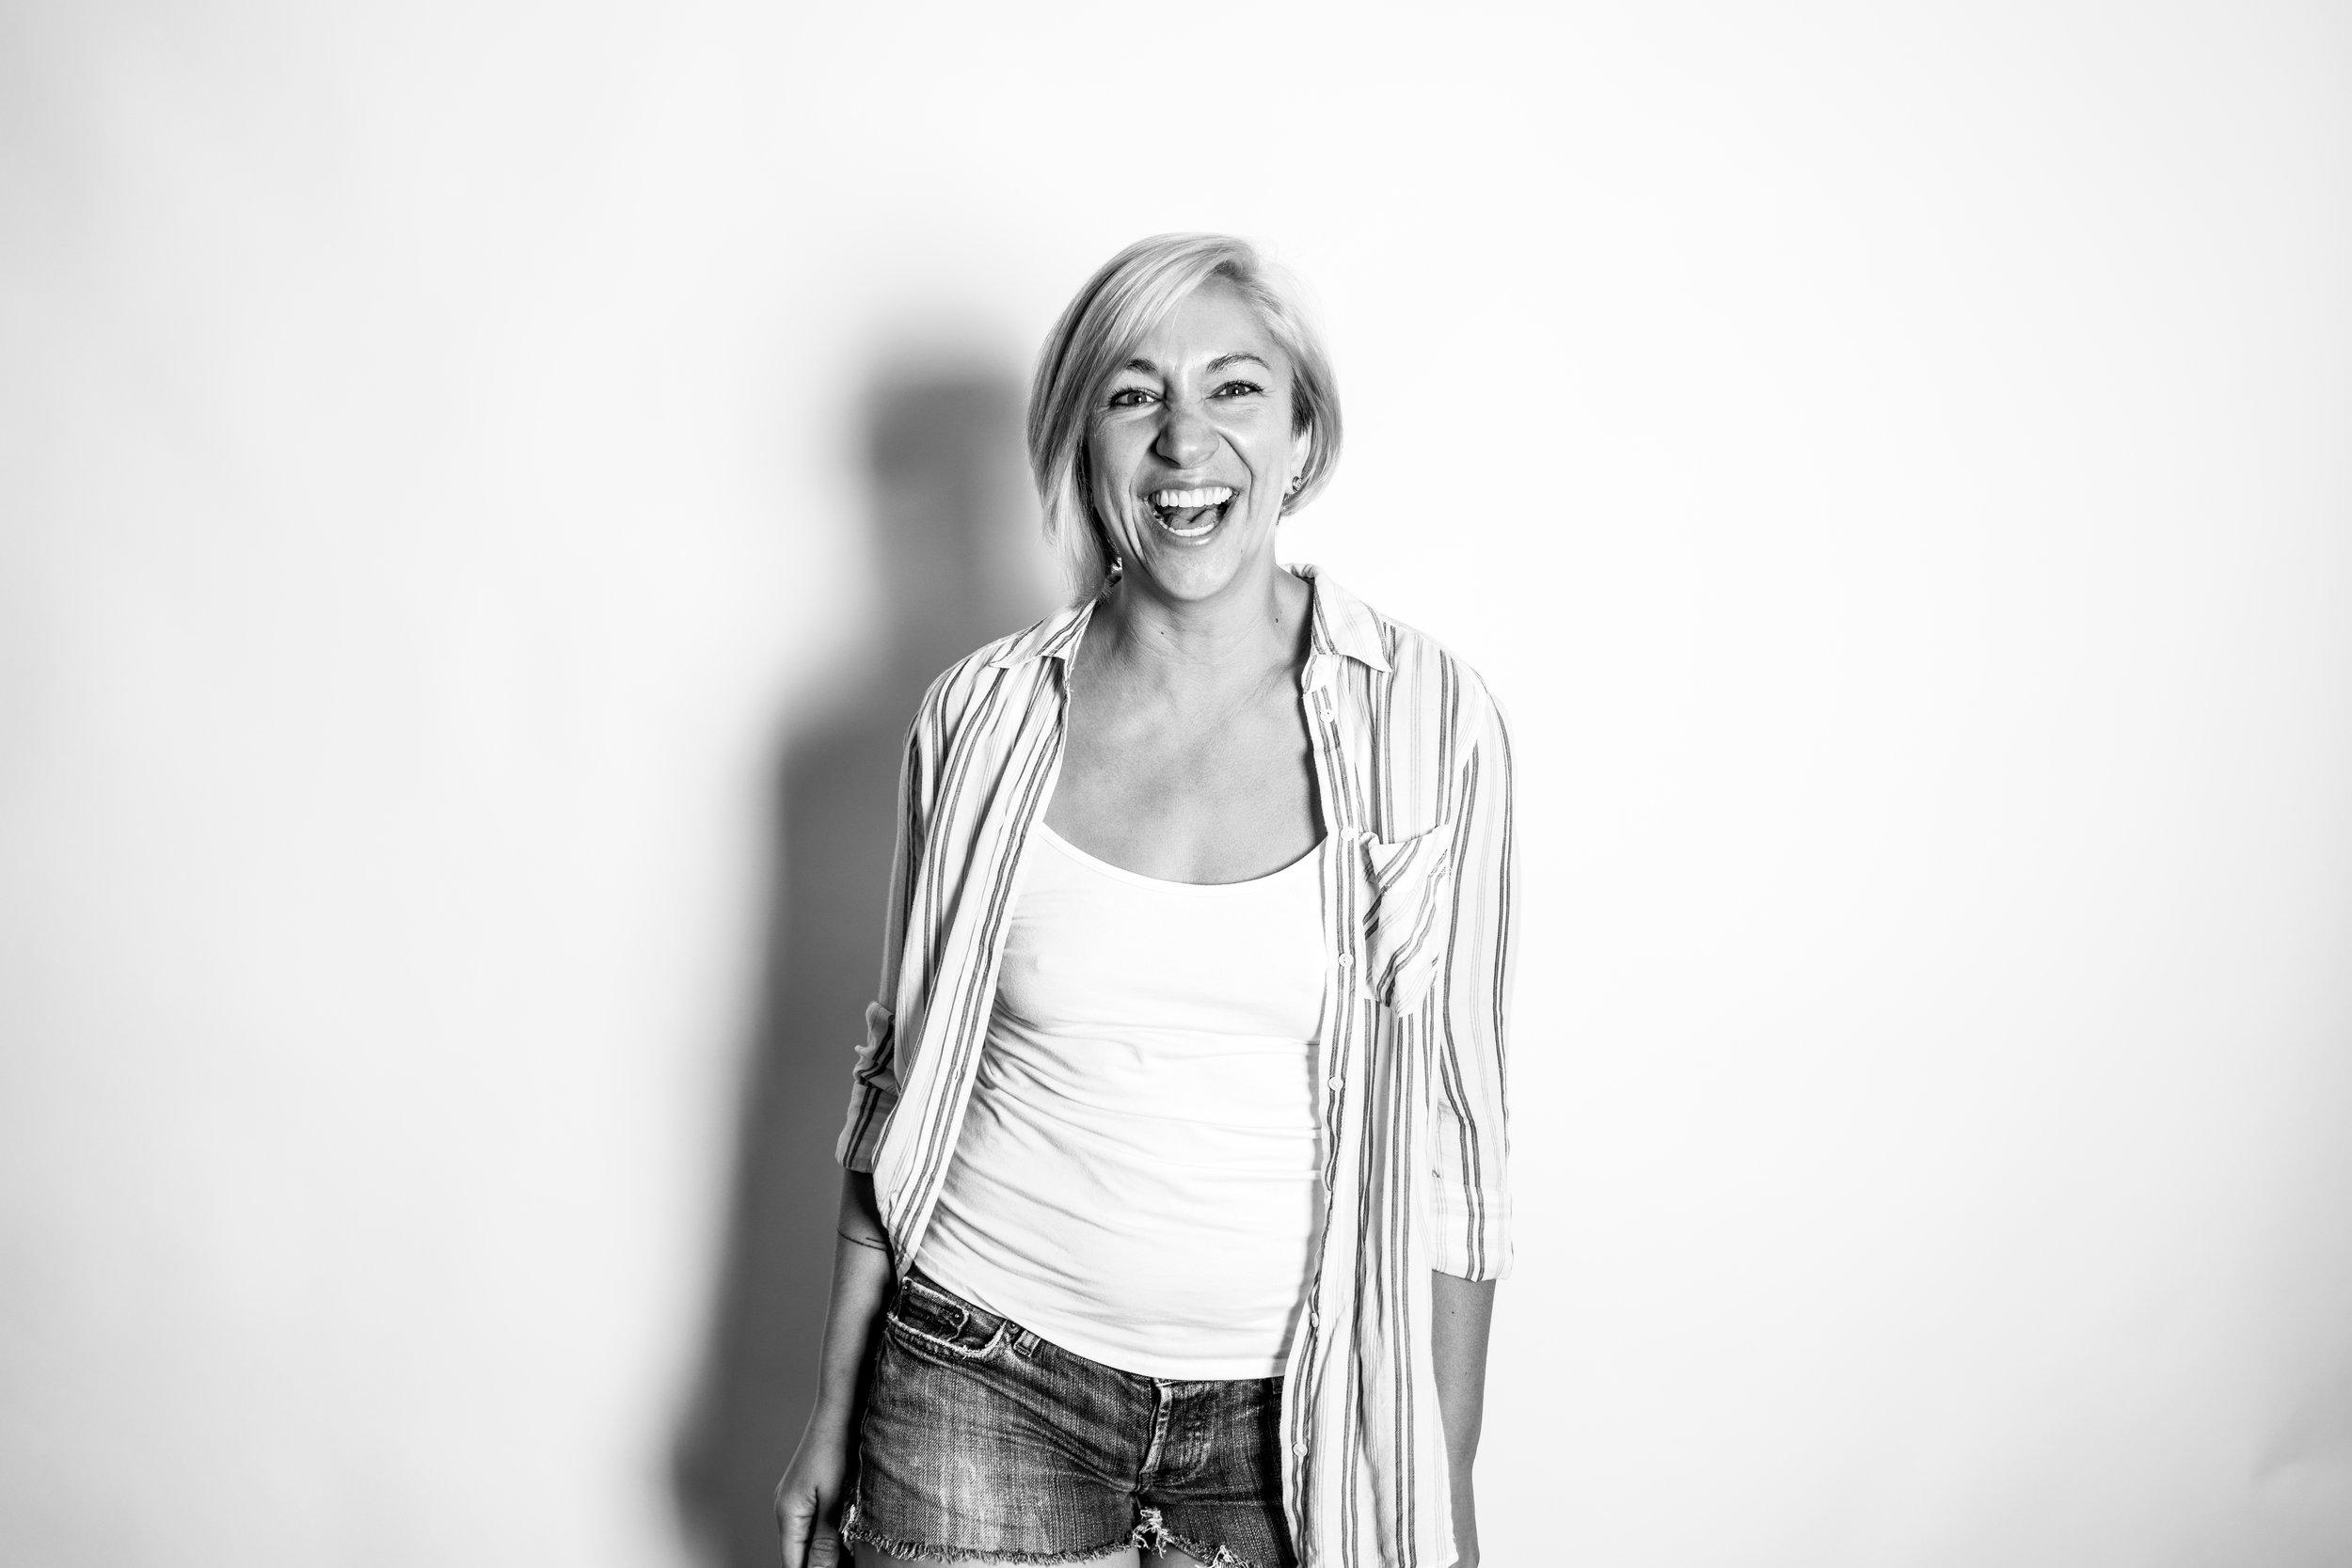 Briana Cribeyer